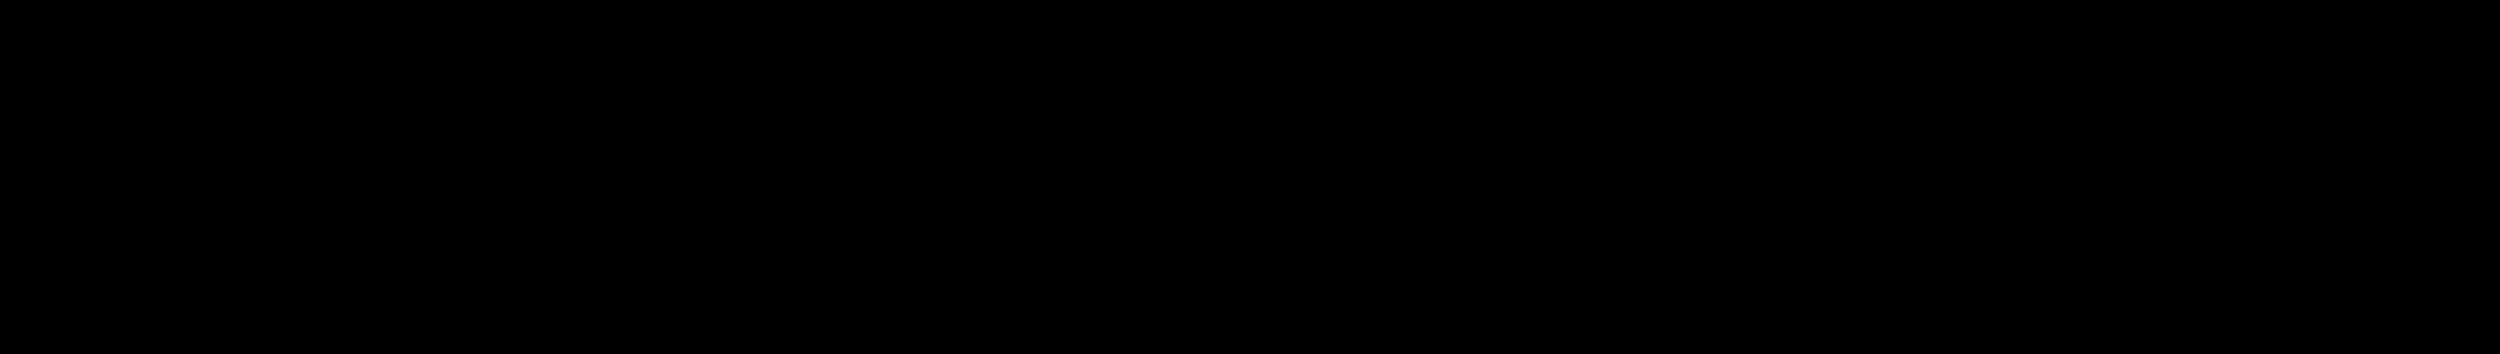 PNG_FULLArtboard 1 copy 2.png